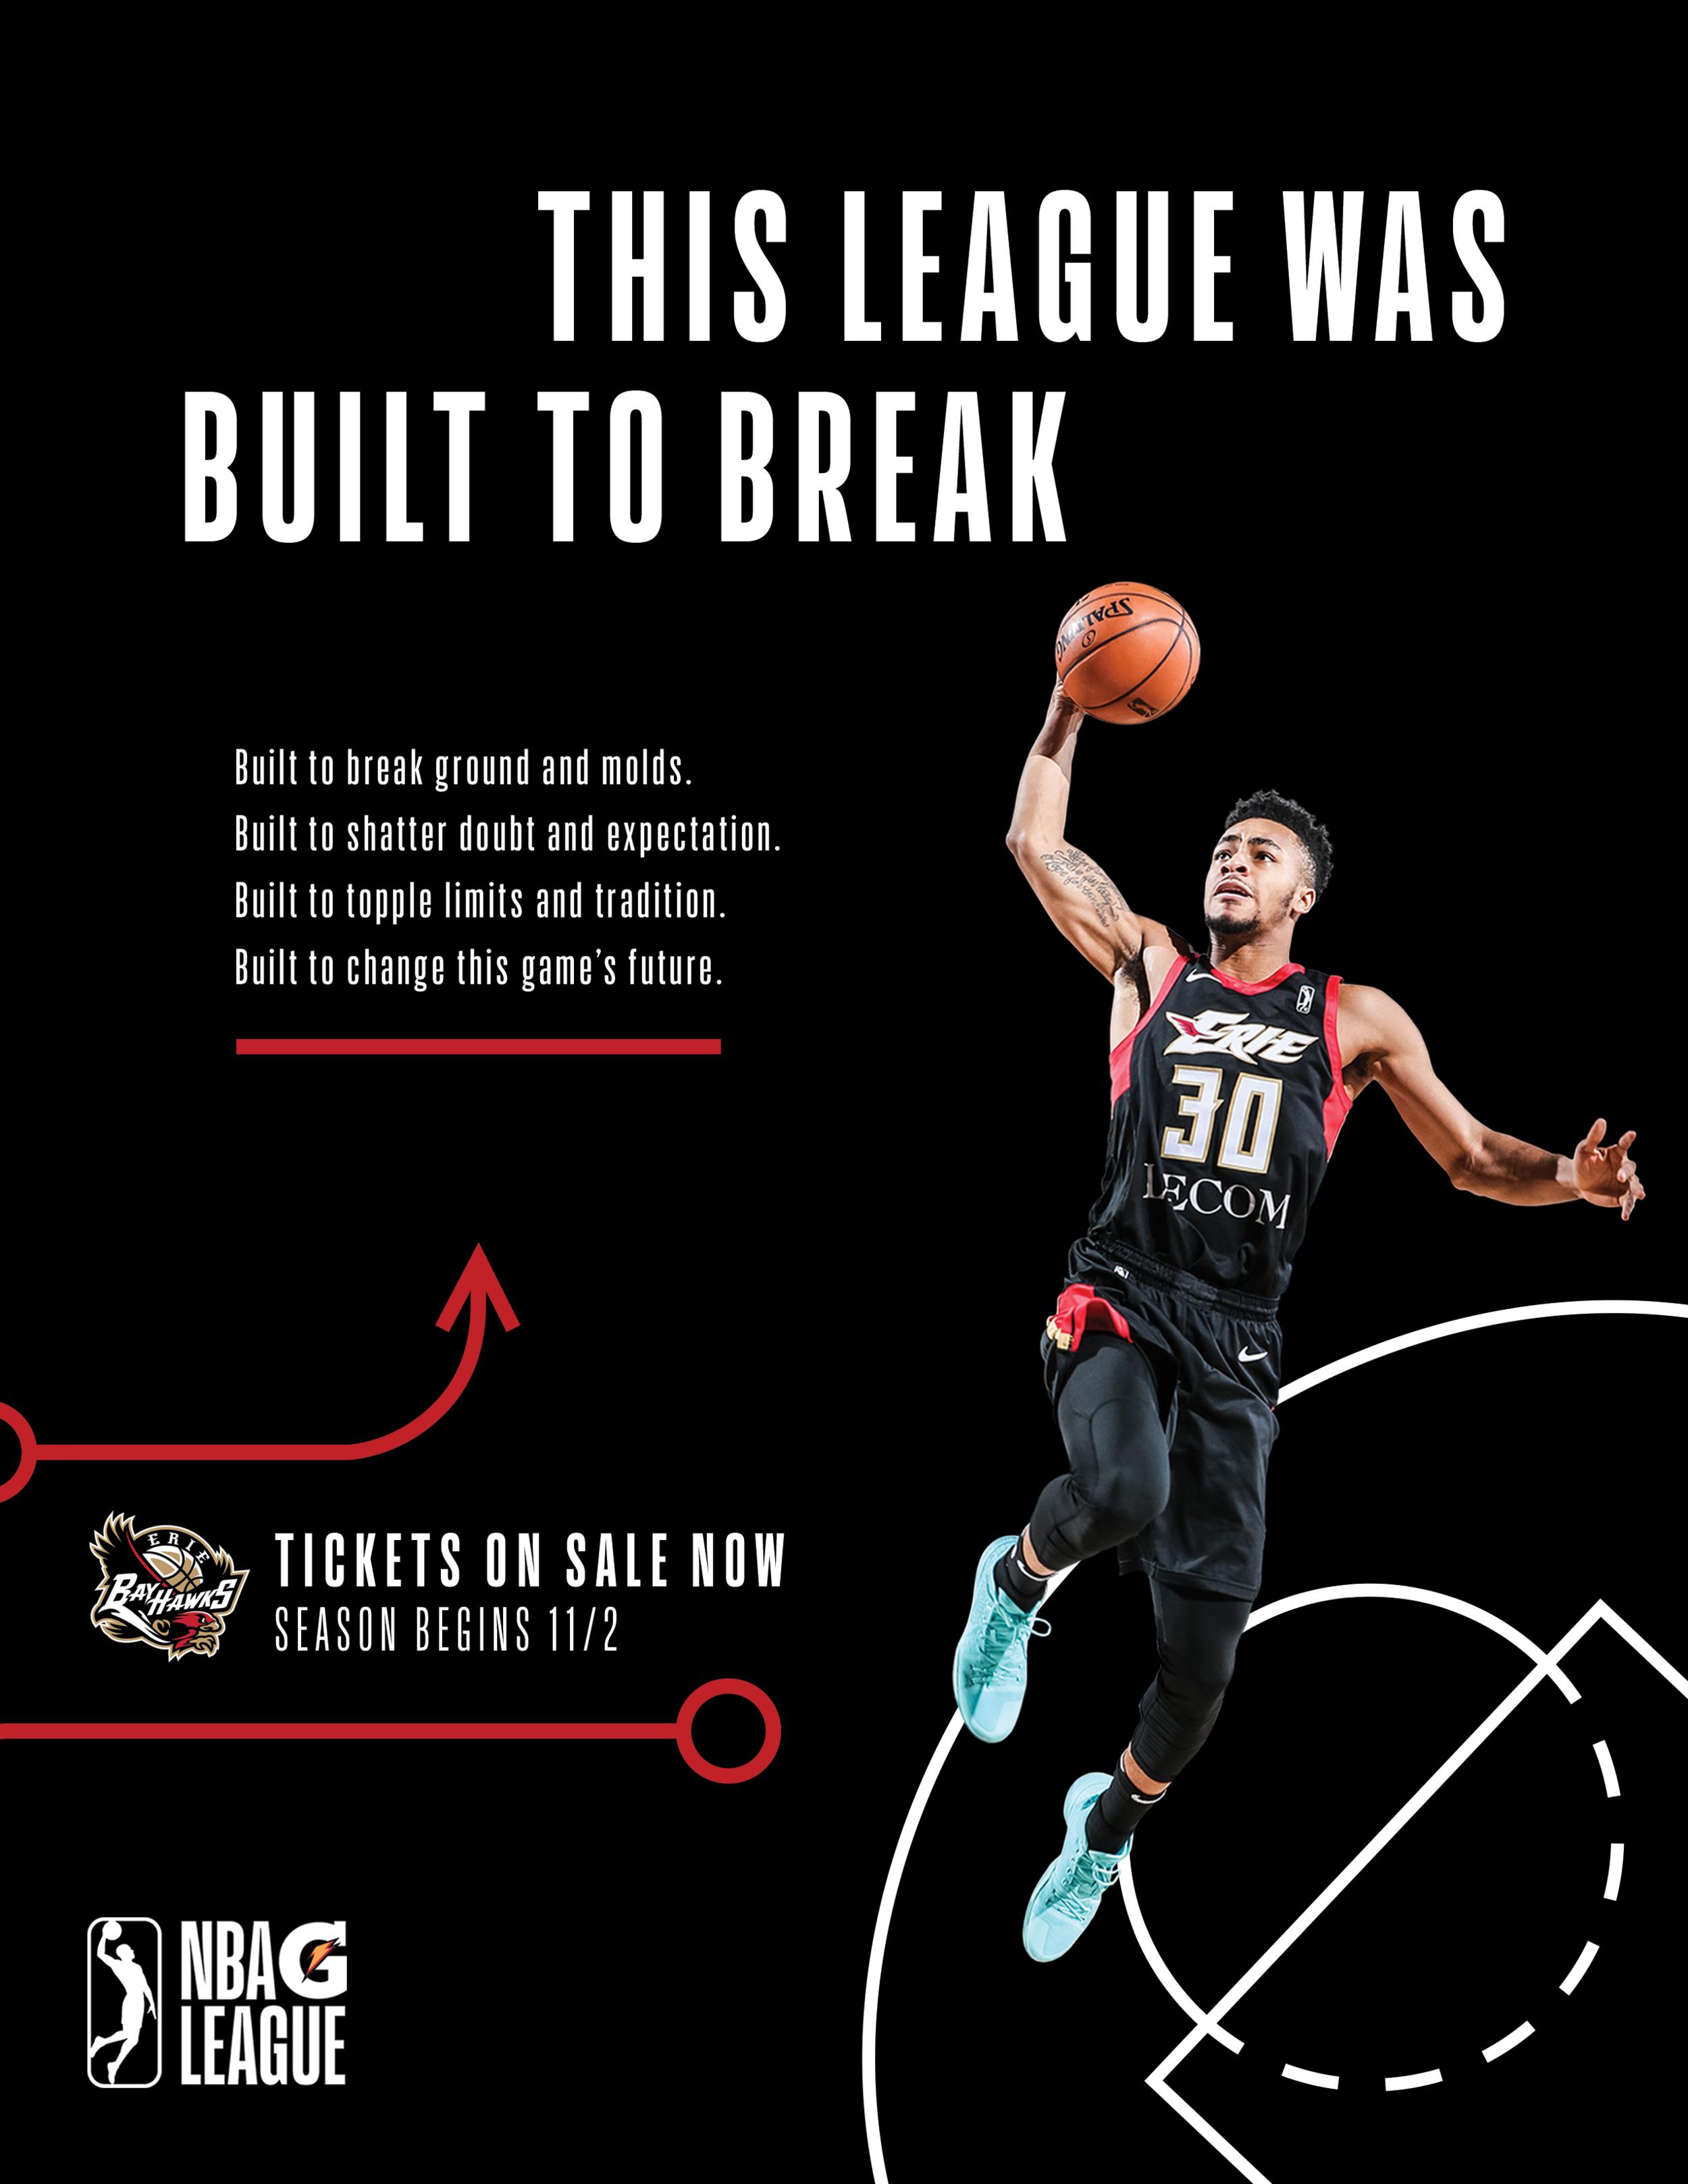 NBAGLeague_PrinAd_Team_ErieBayHawks.png